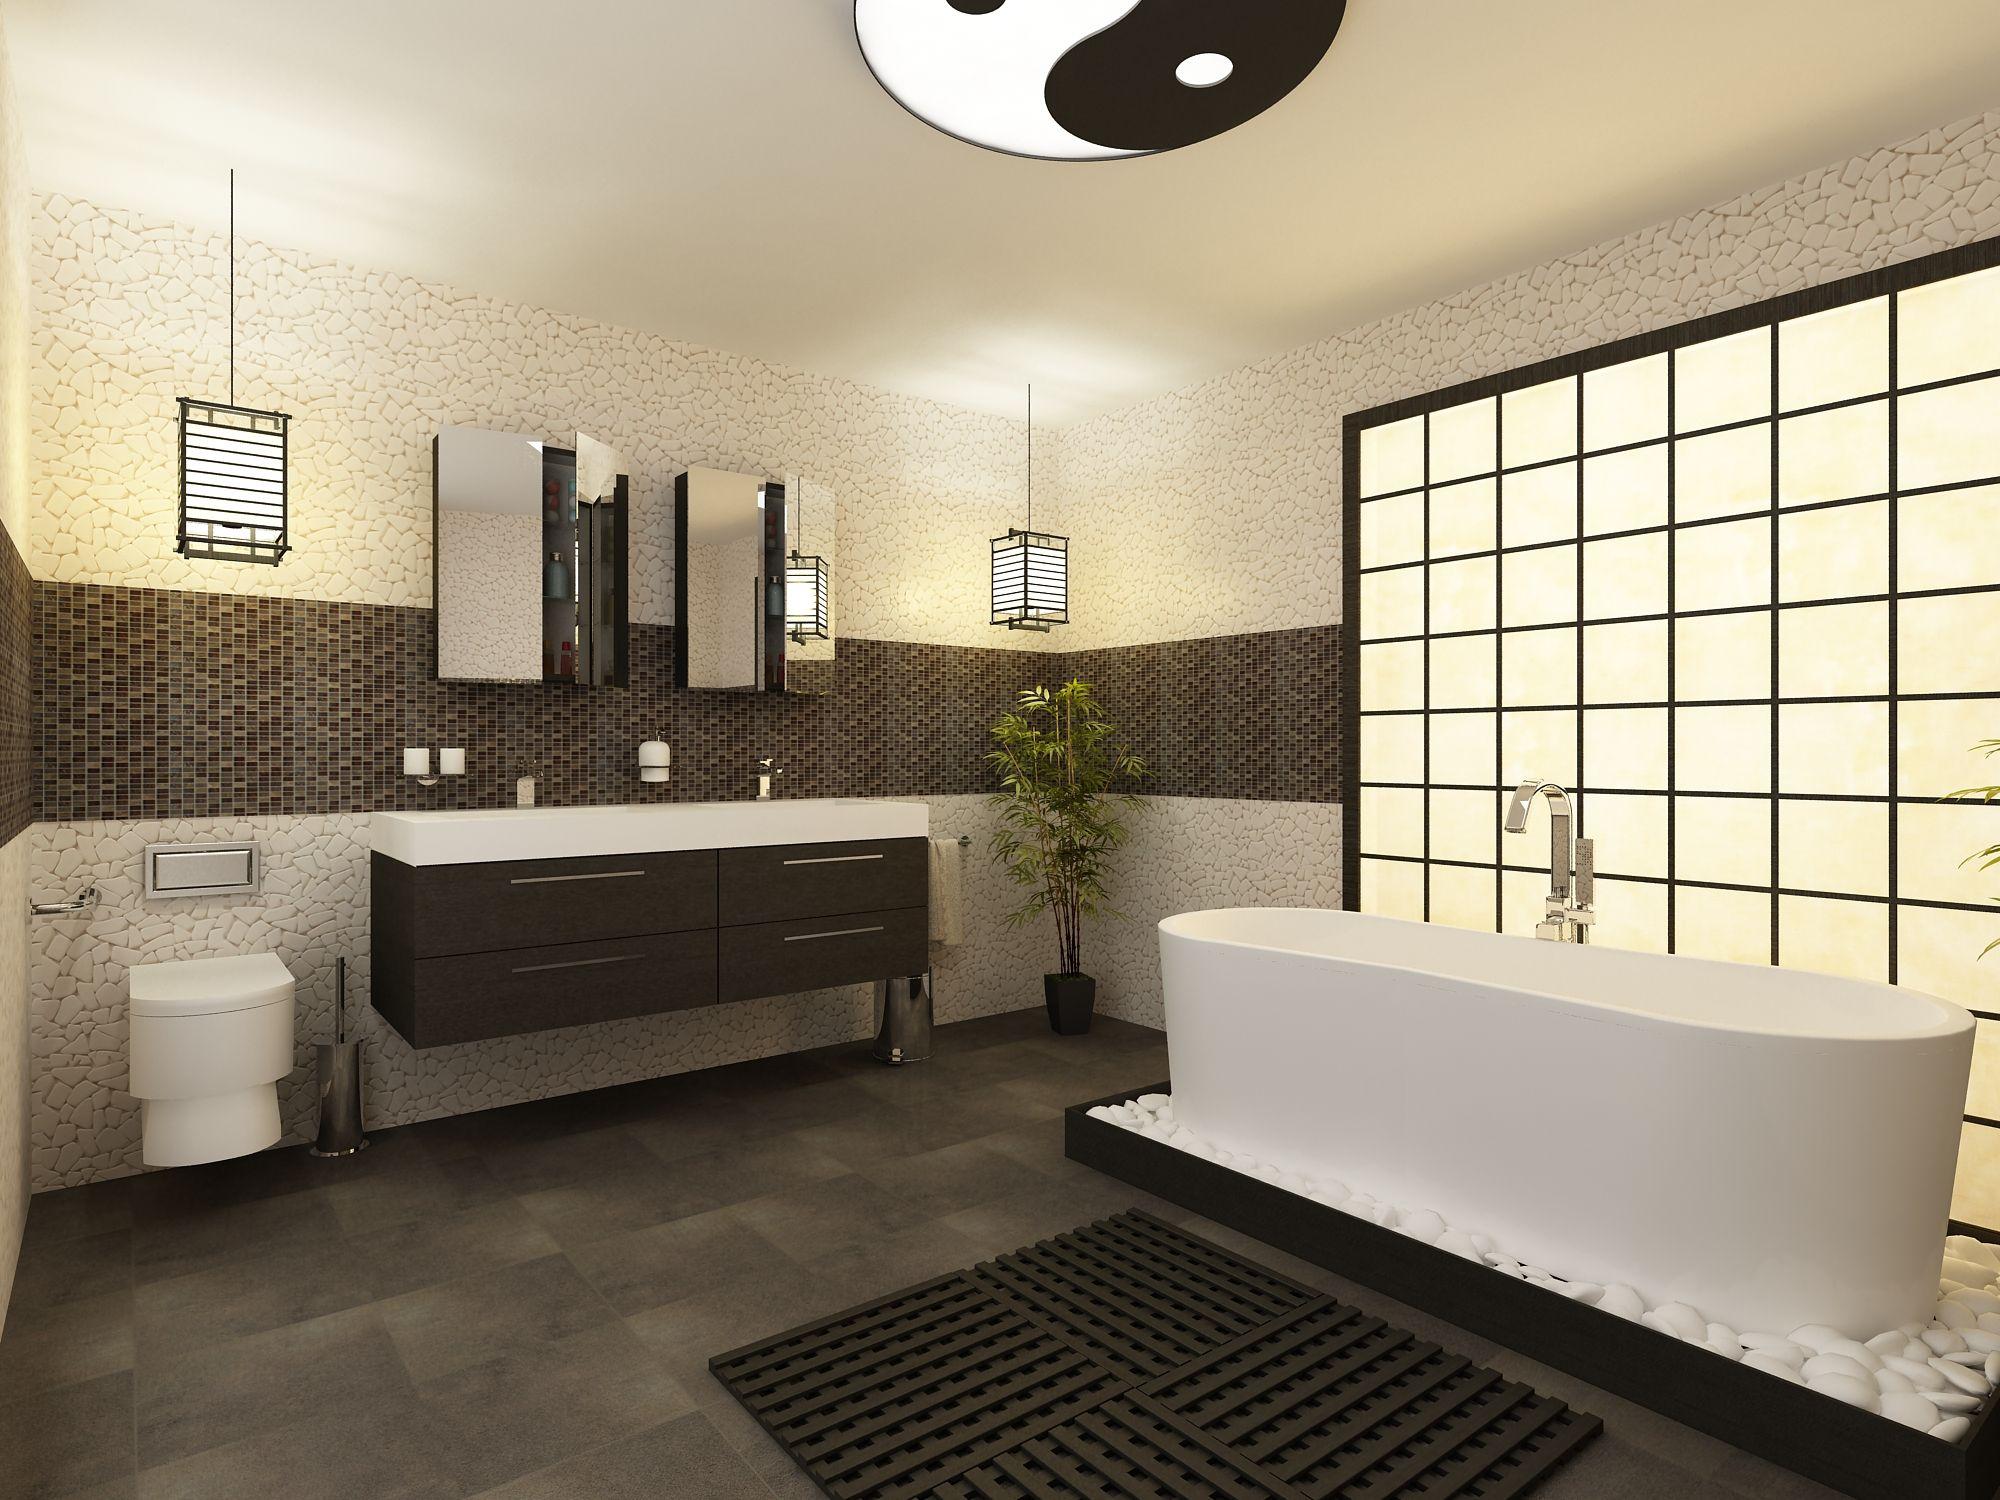 salle de bain plafond turquoise google search beautiful